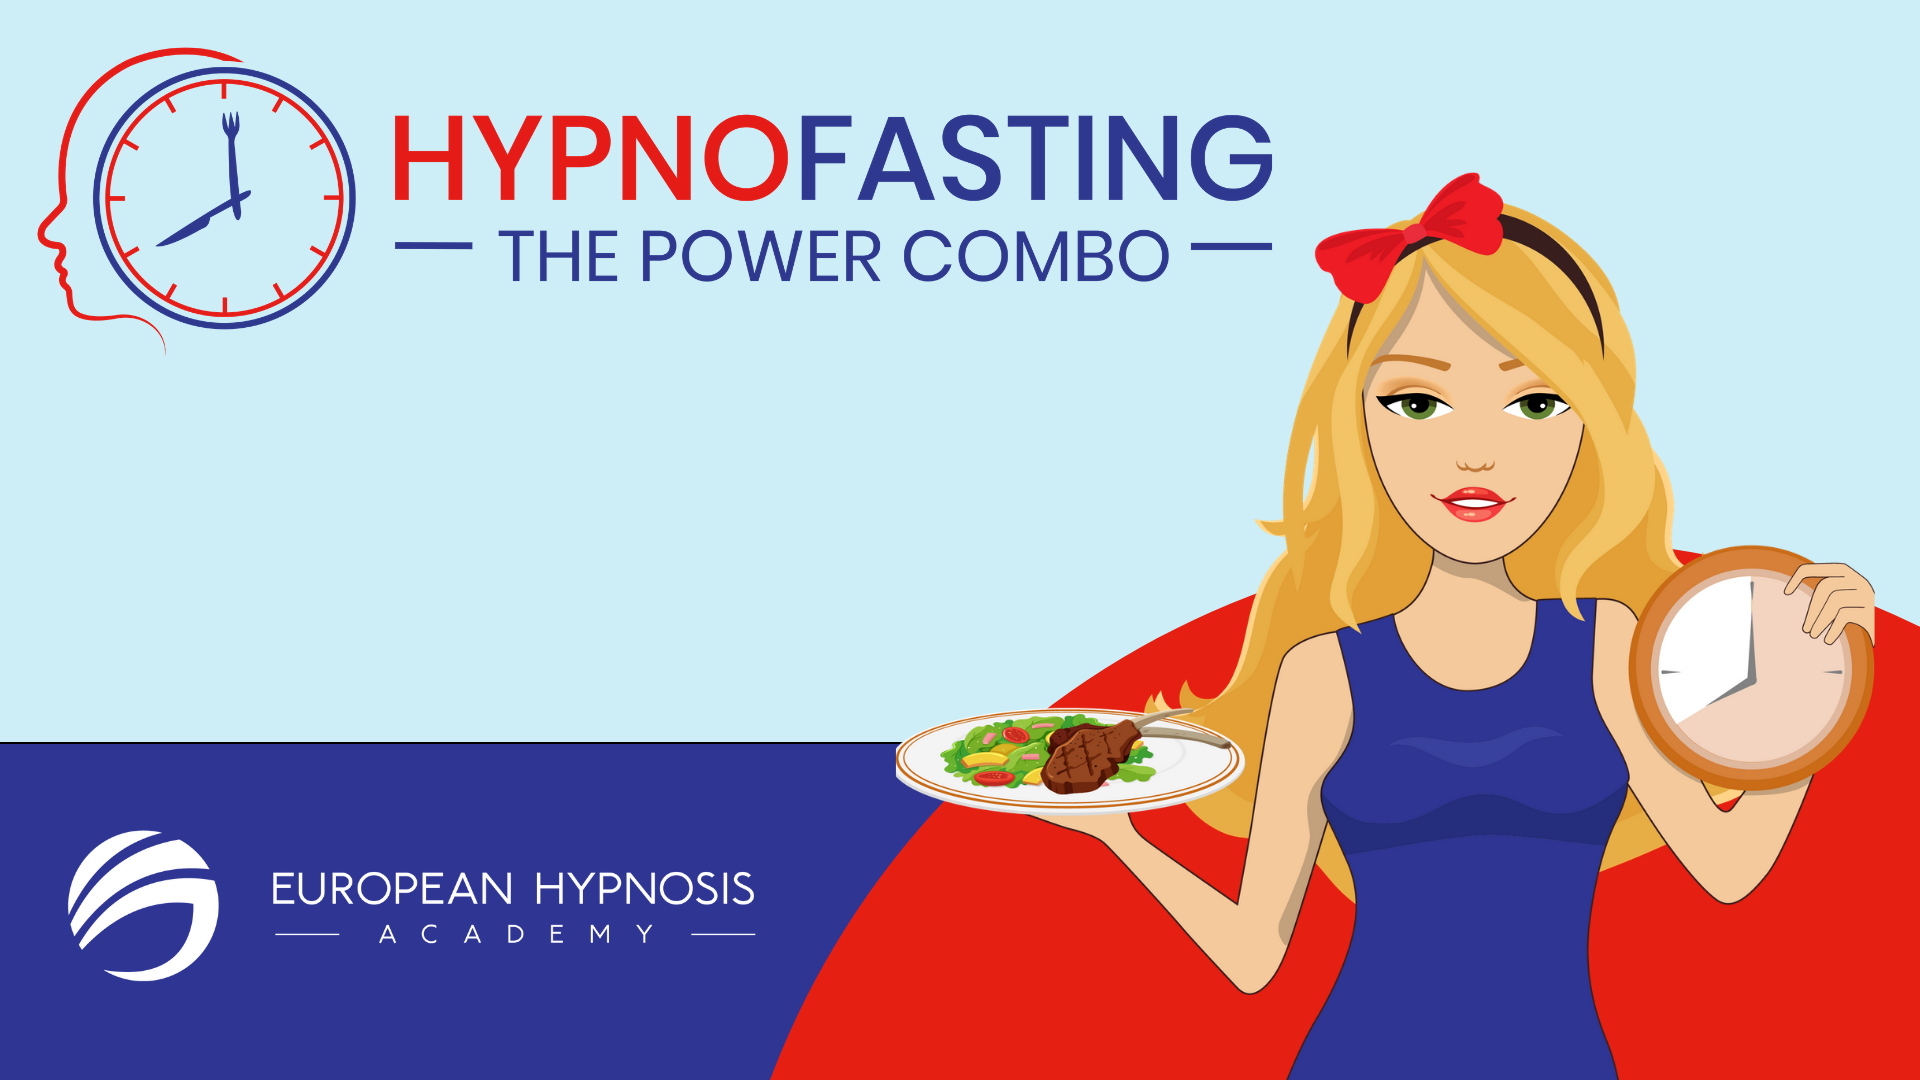 HypnoFasting Expert